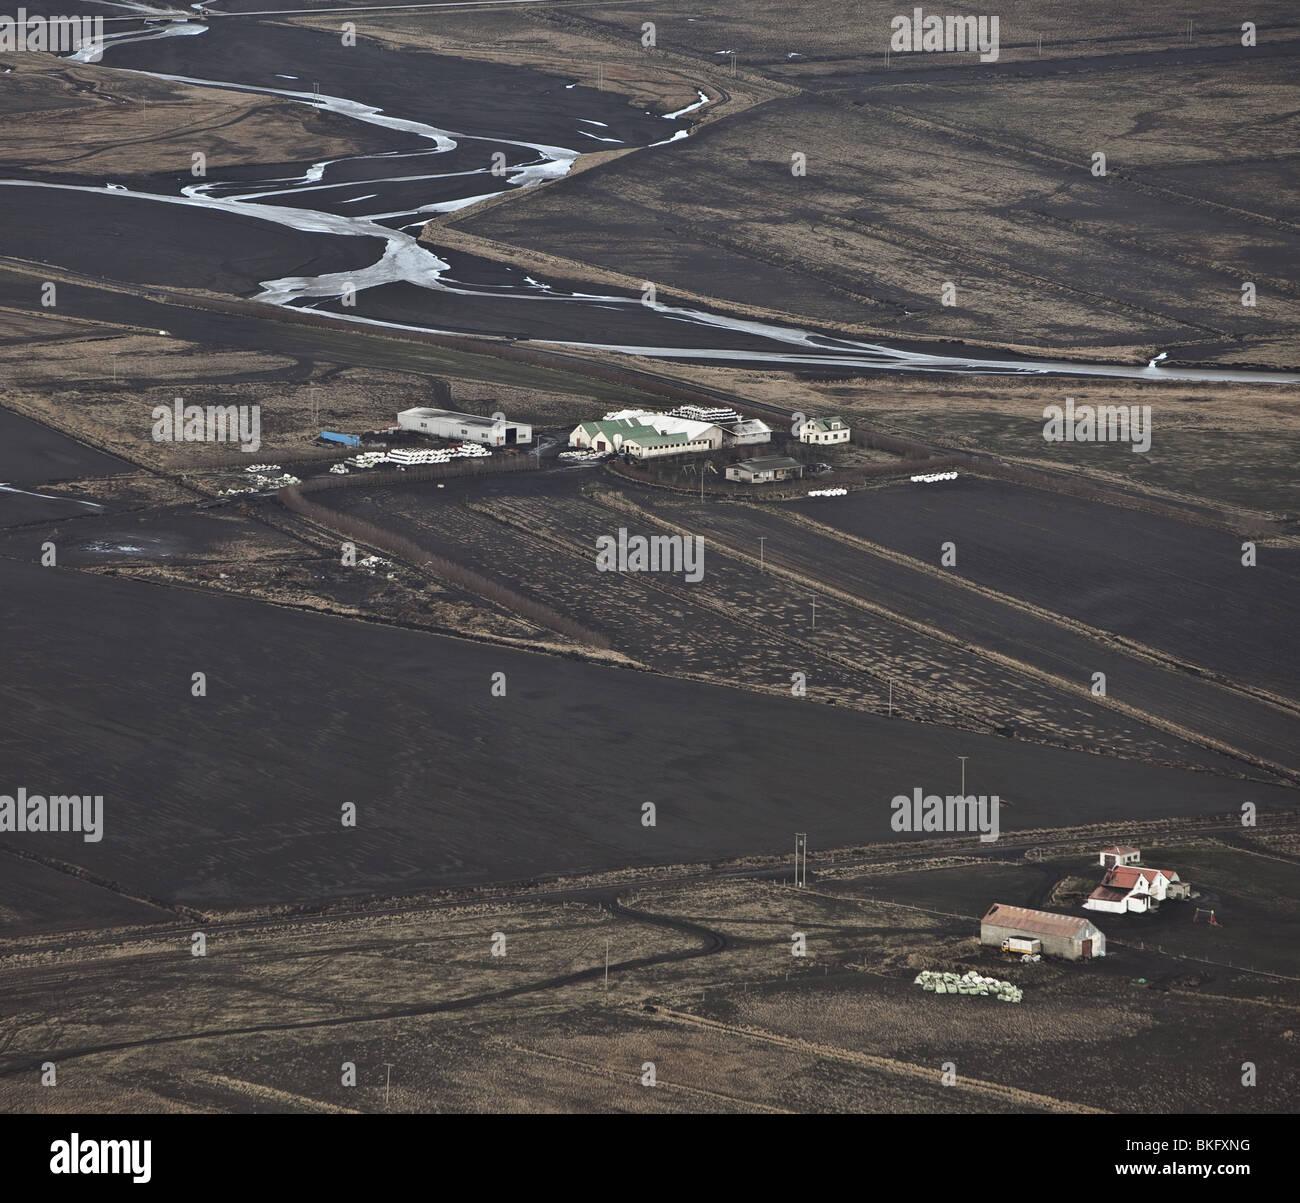 À partir de la chute de cendres Volcan Eyjafjallajokull en Islande, qui a débuté le 14 avril 2010. Photo Stock